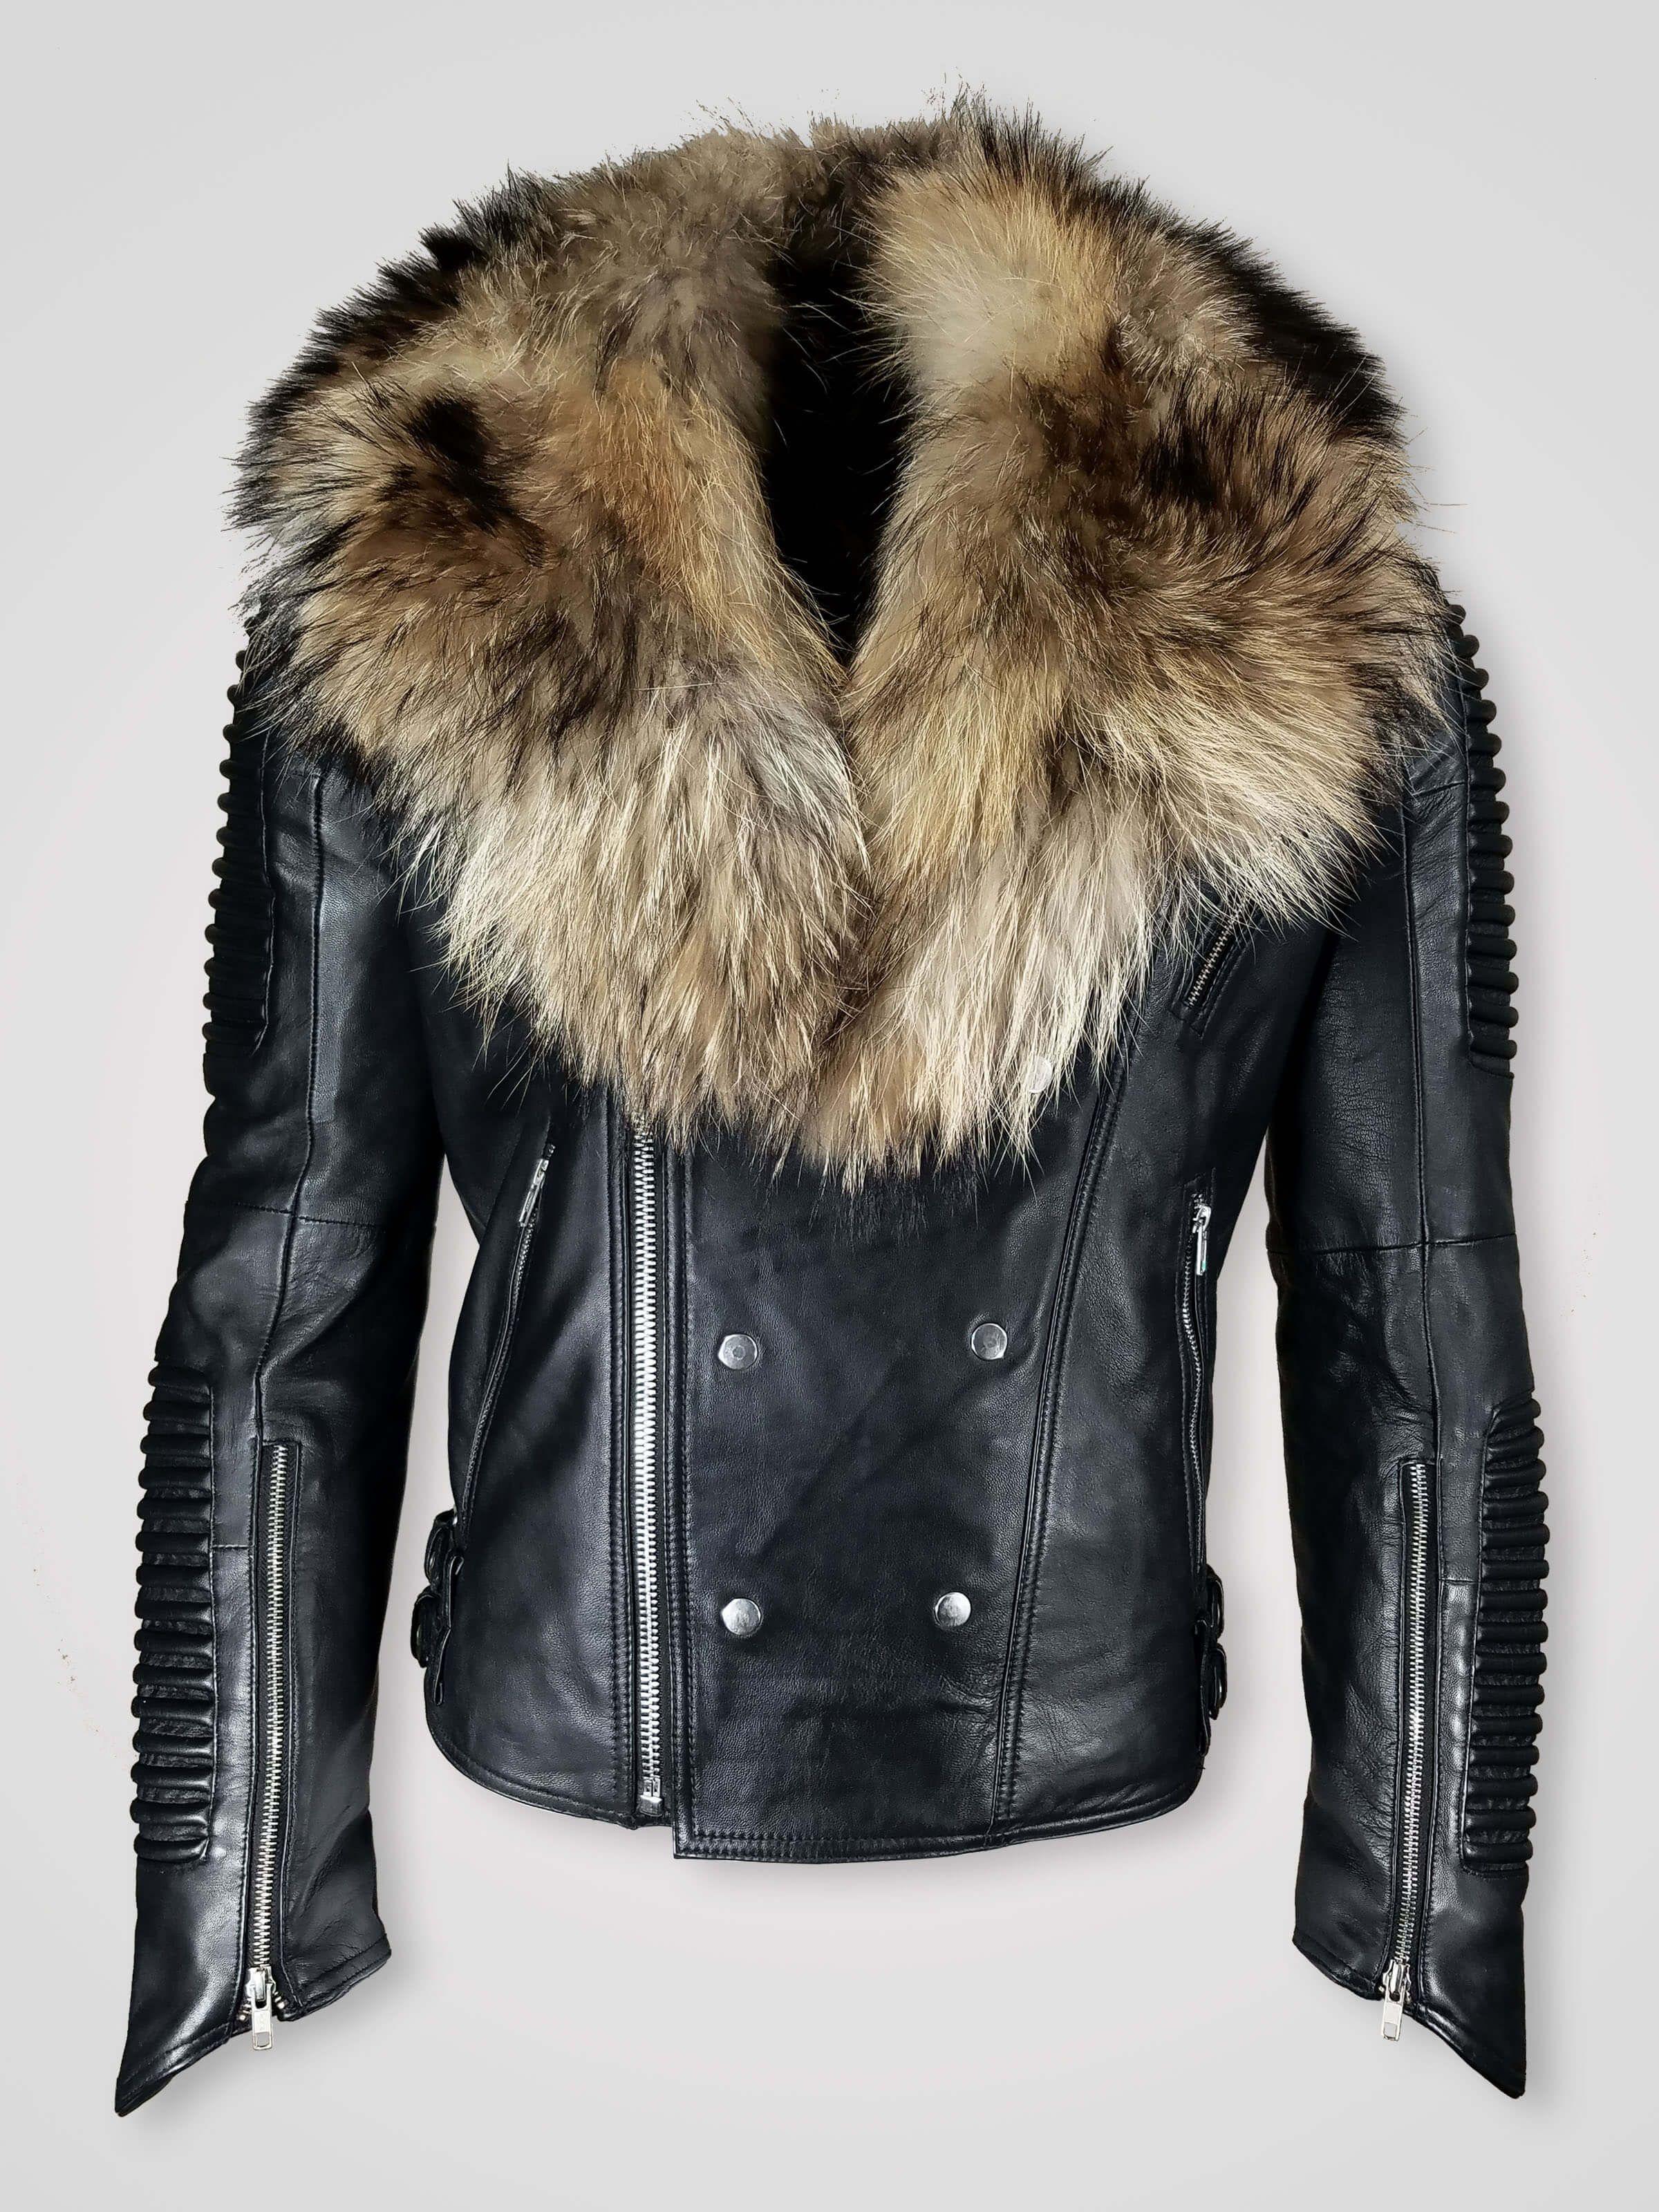 Men S Motorcycle Biker Jacket With Detachable Raccoon Fur Collar In Black Fur Leather Jacket Leather Jacket Style Leather Jacket Men Style [ 3200 x 2400 Pixel ]